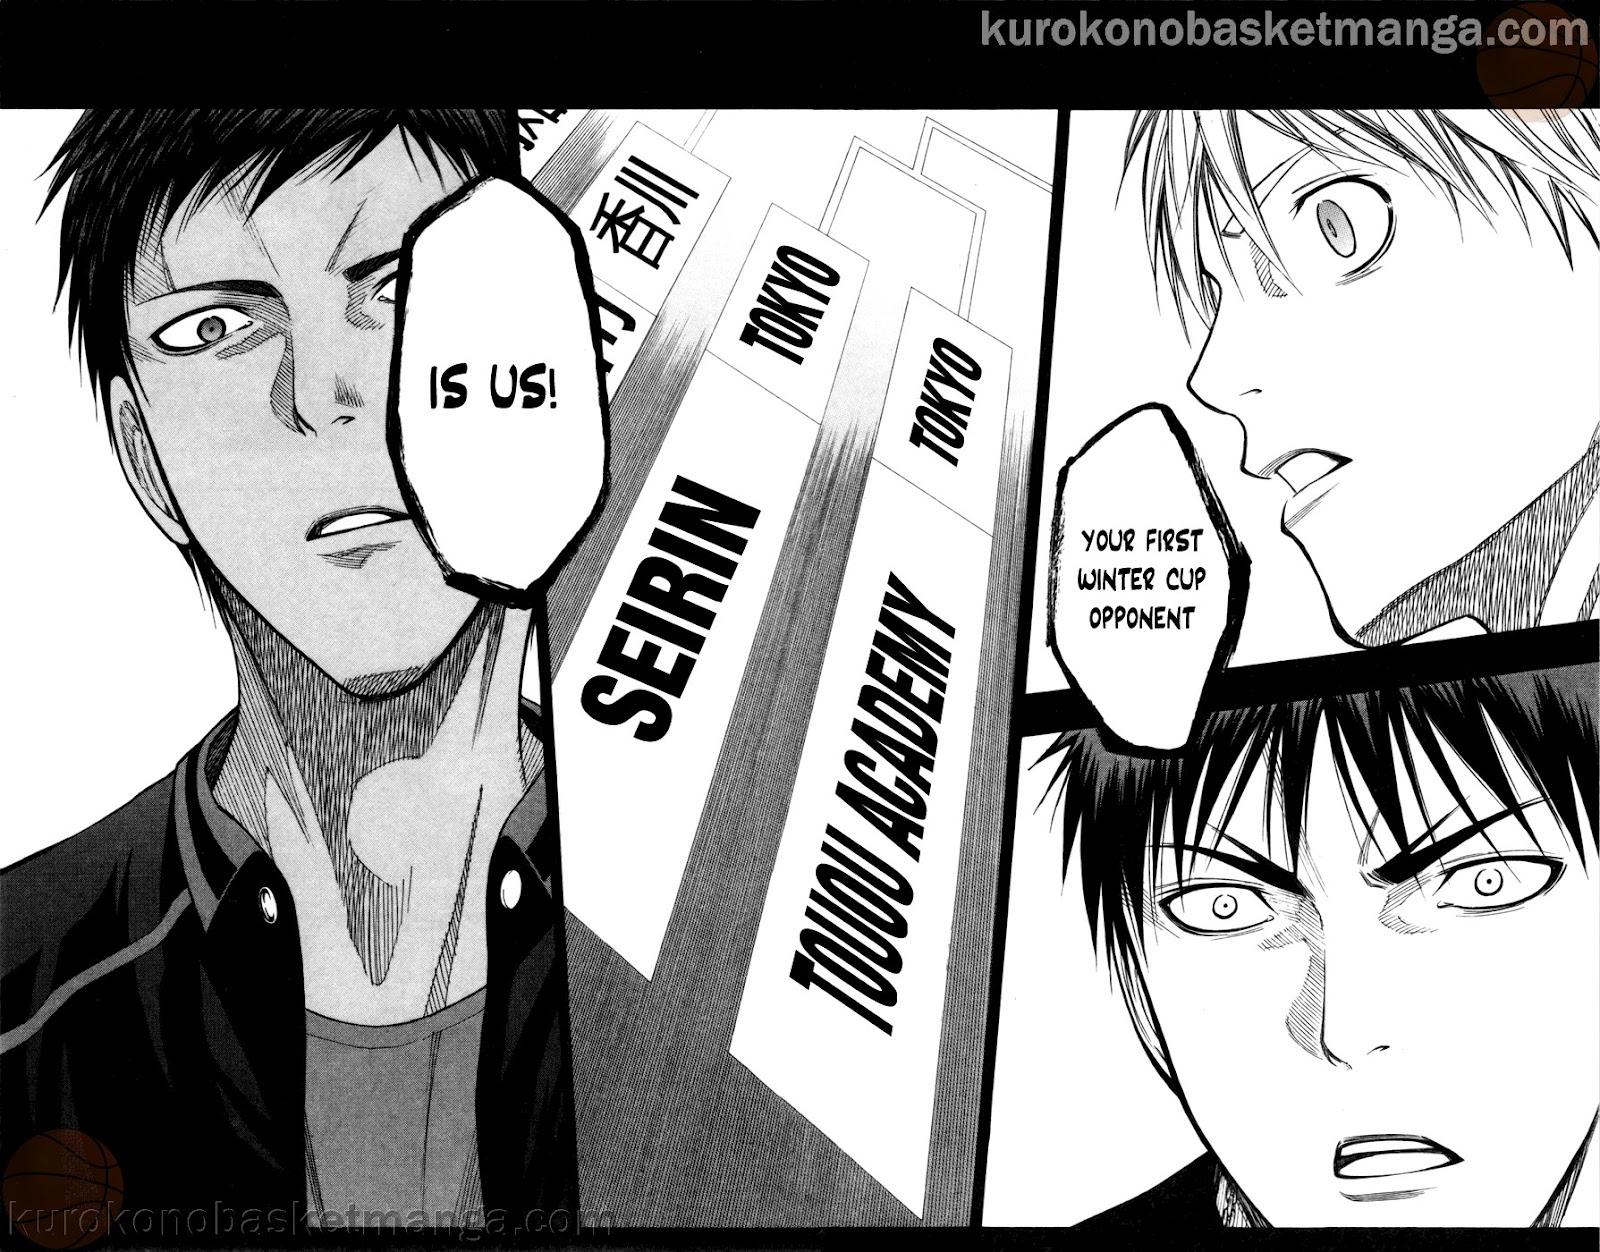 Kuroko no Basket Manga Chapter 110 - Image 12-13